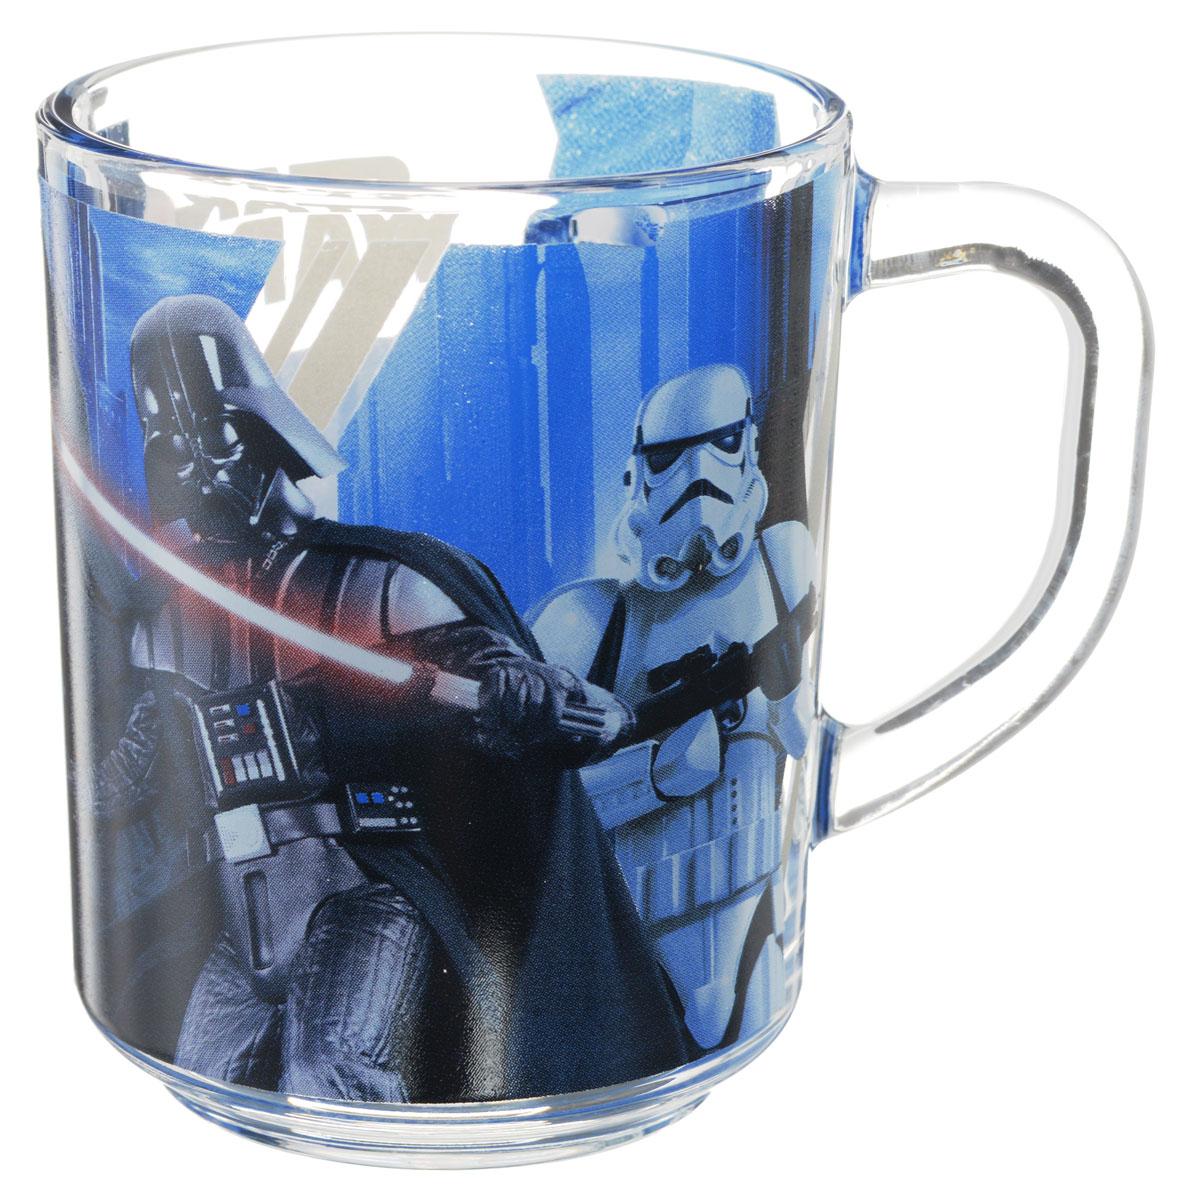 Star Wars Кружка детская Дарт Вейдер и штурмовики 250 мл